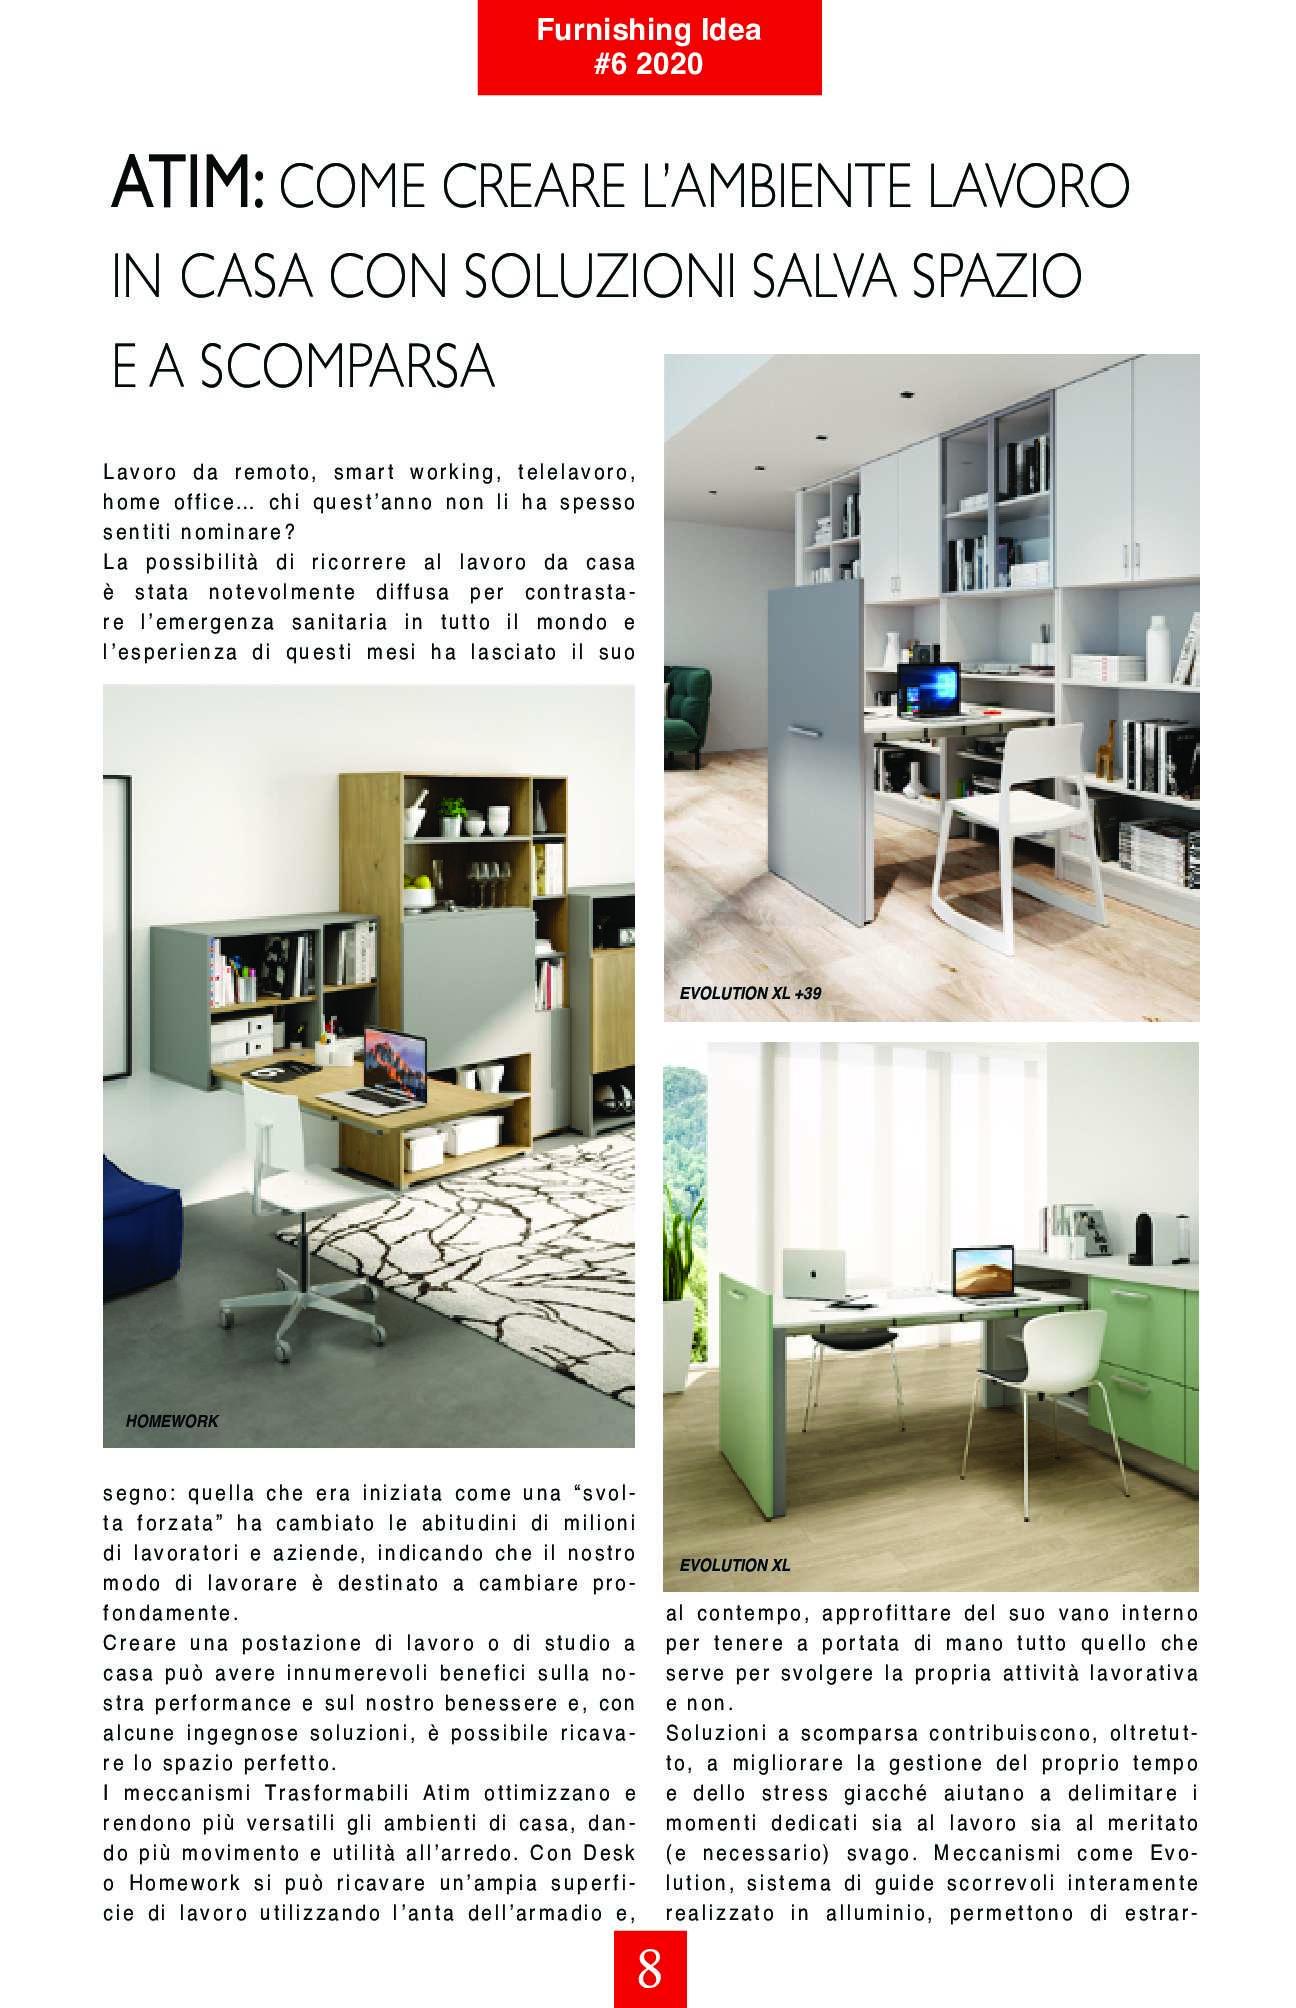 furnishingidea-6-2020_journal_22_007.jpg